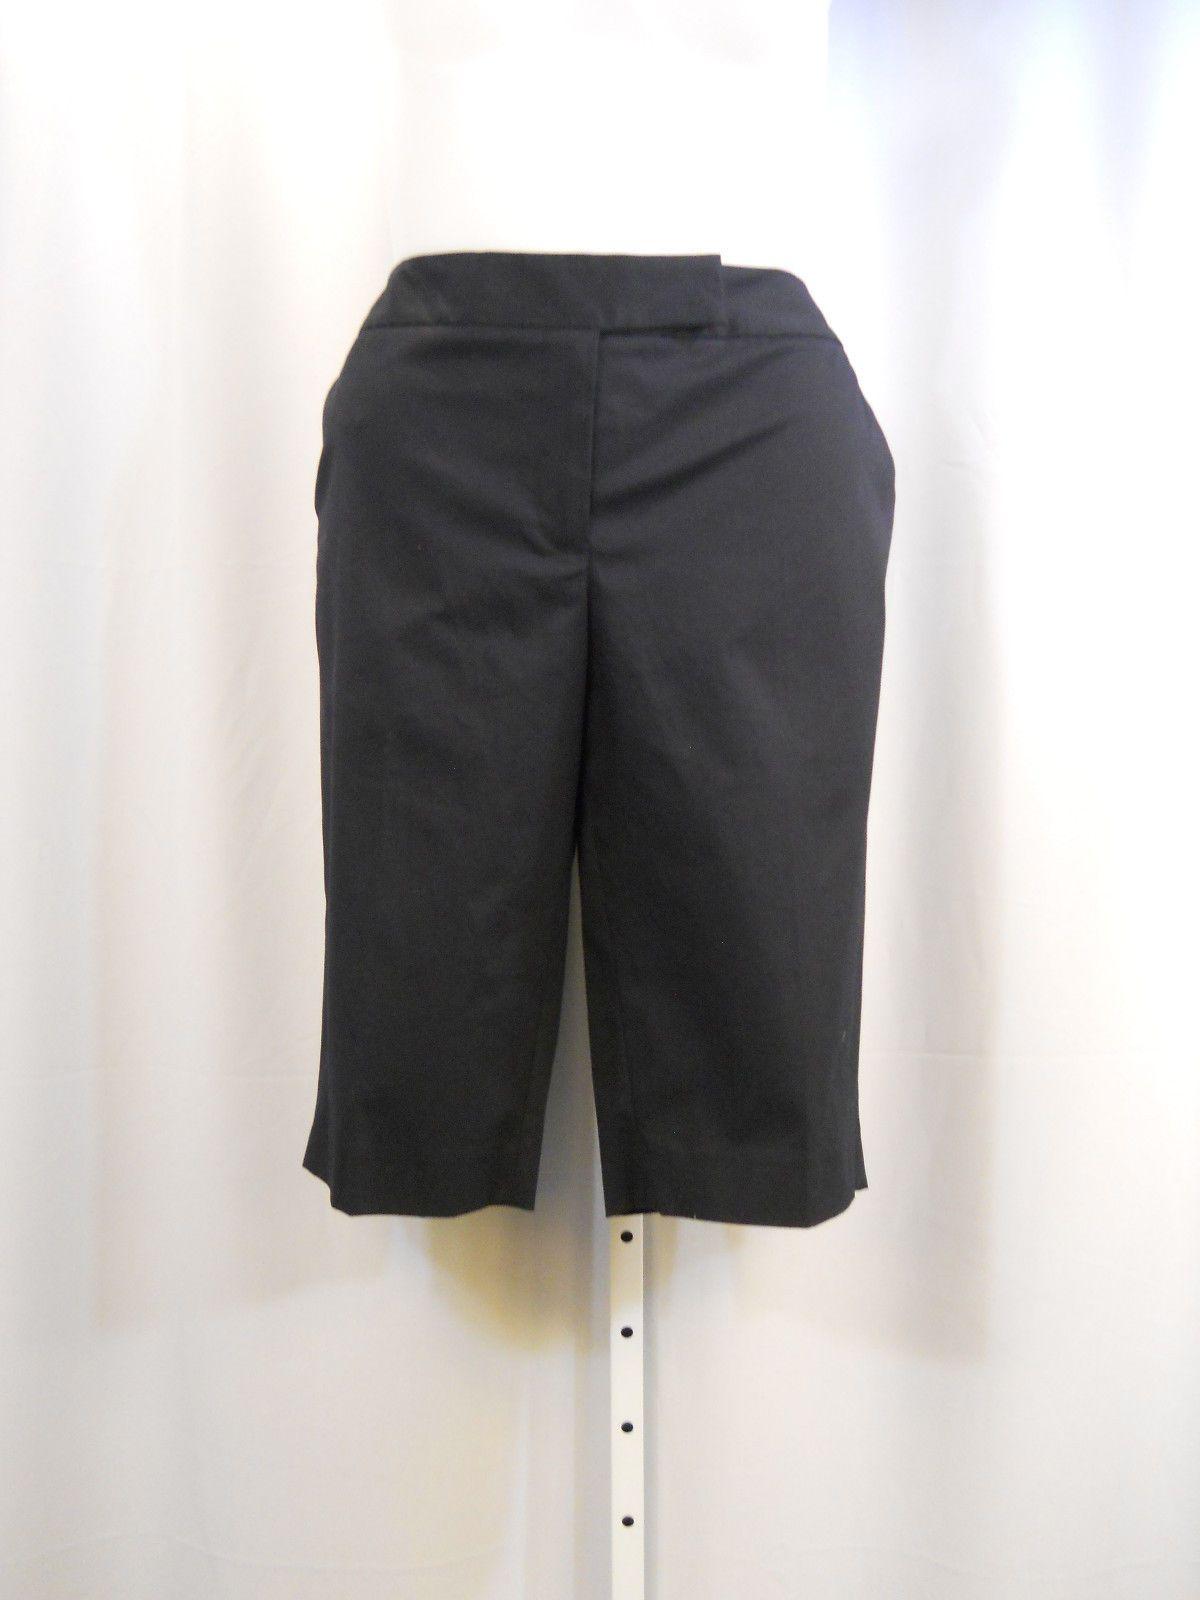 PLUS SIZE 14W Dress Shorts JONES NEW YORK Solid Blue Zip Hook Closure 38X14